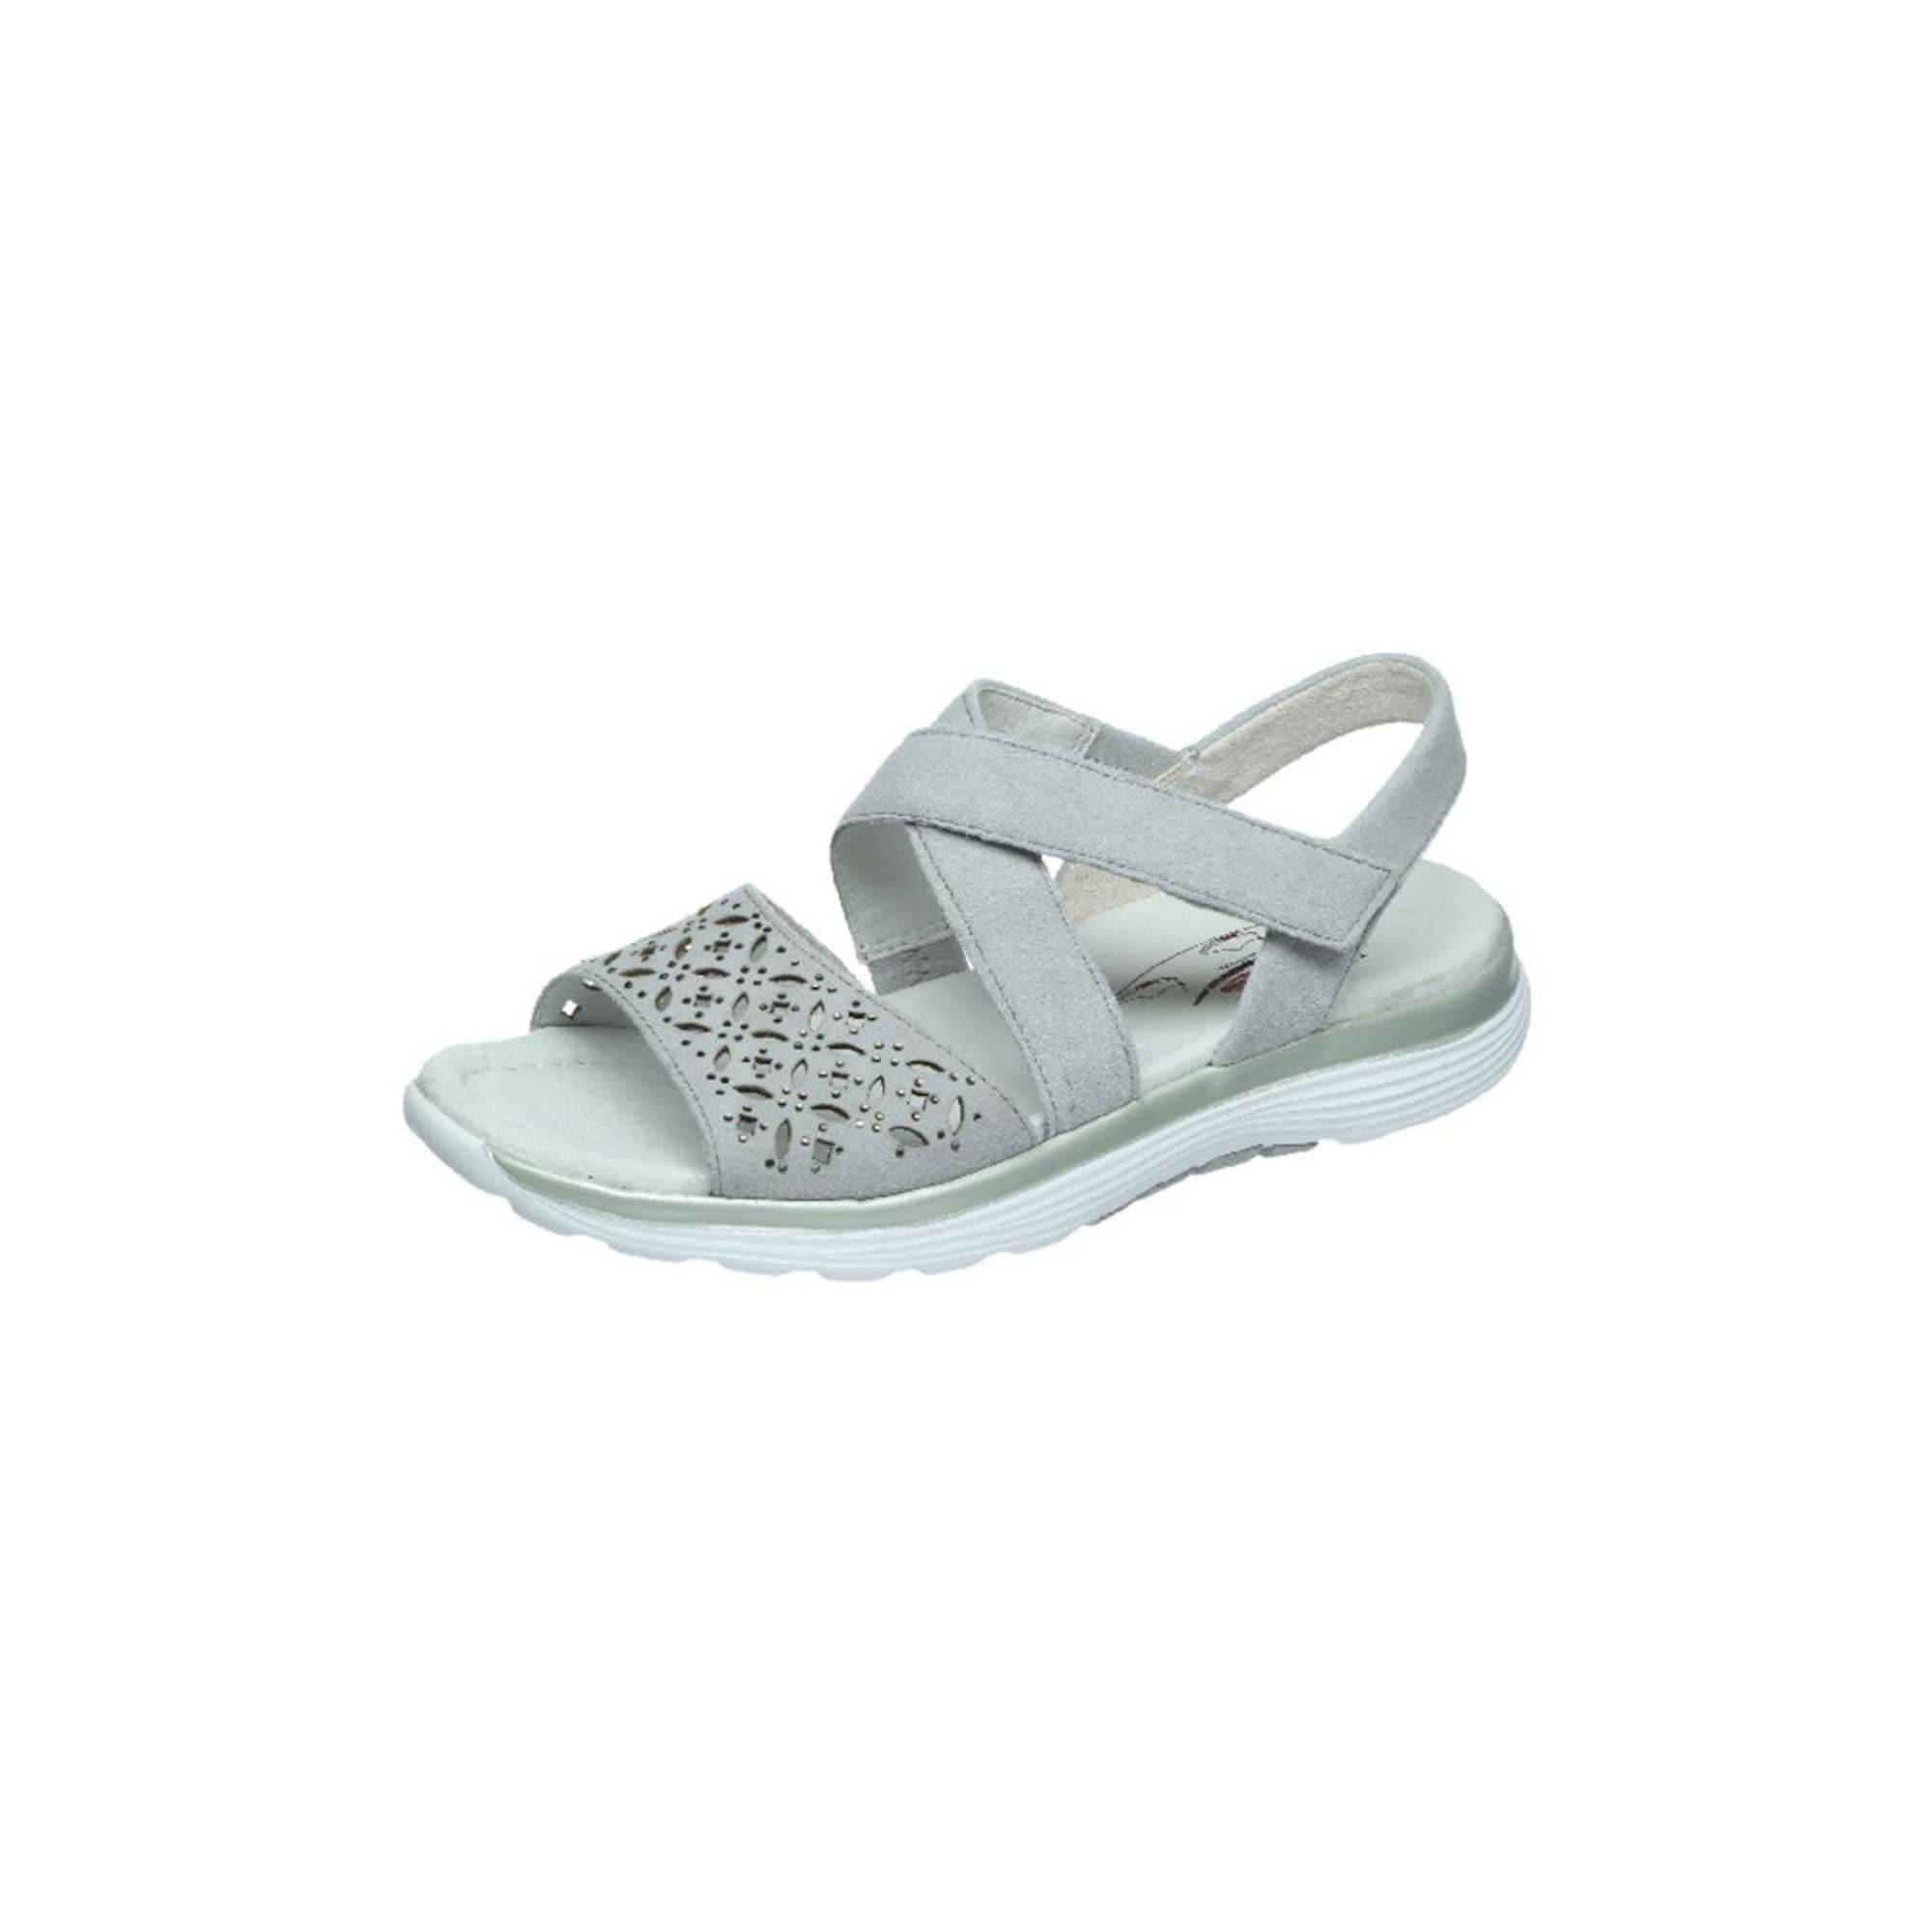 Sandalen | Schuhe > Sandalen & Zehentrenner > Sandalen | Gabor